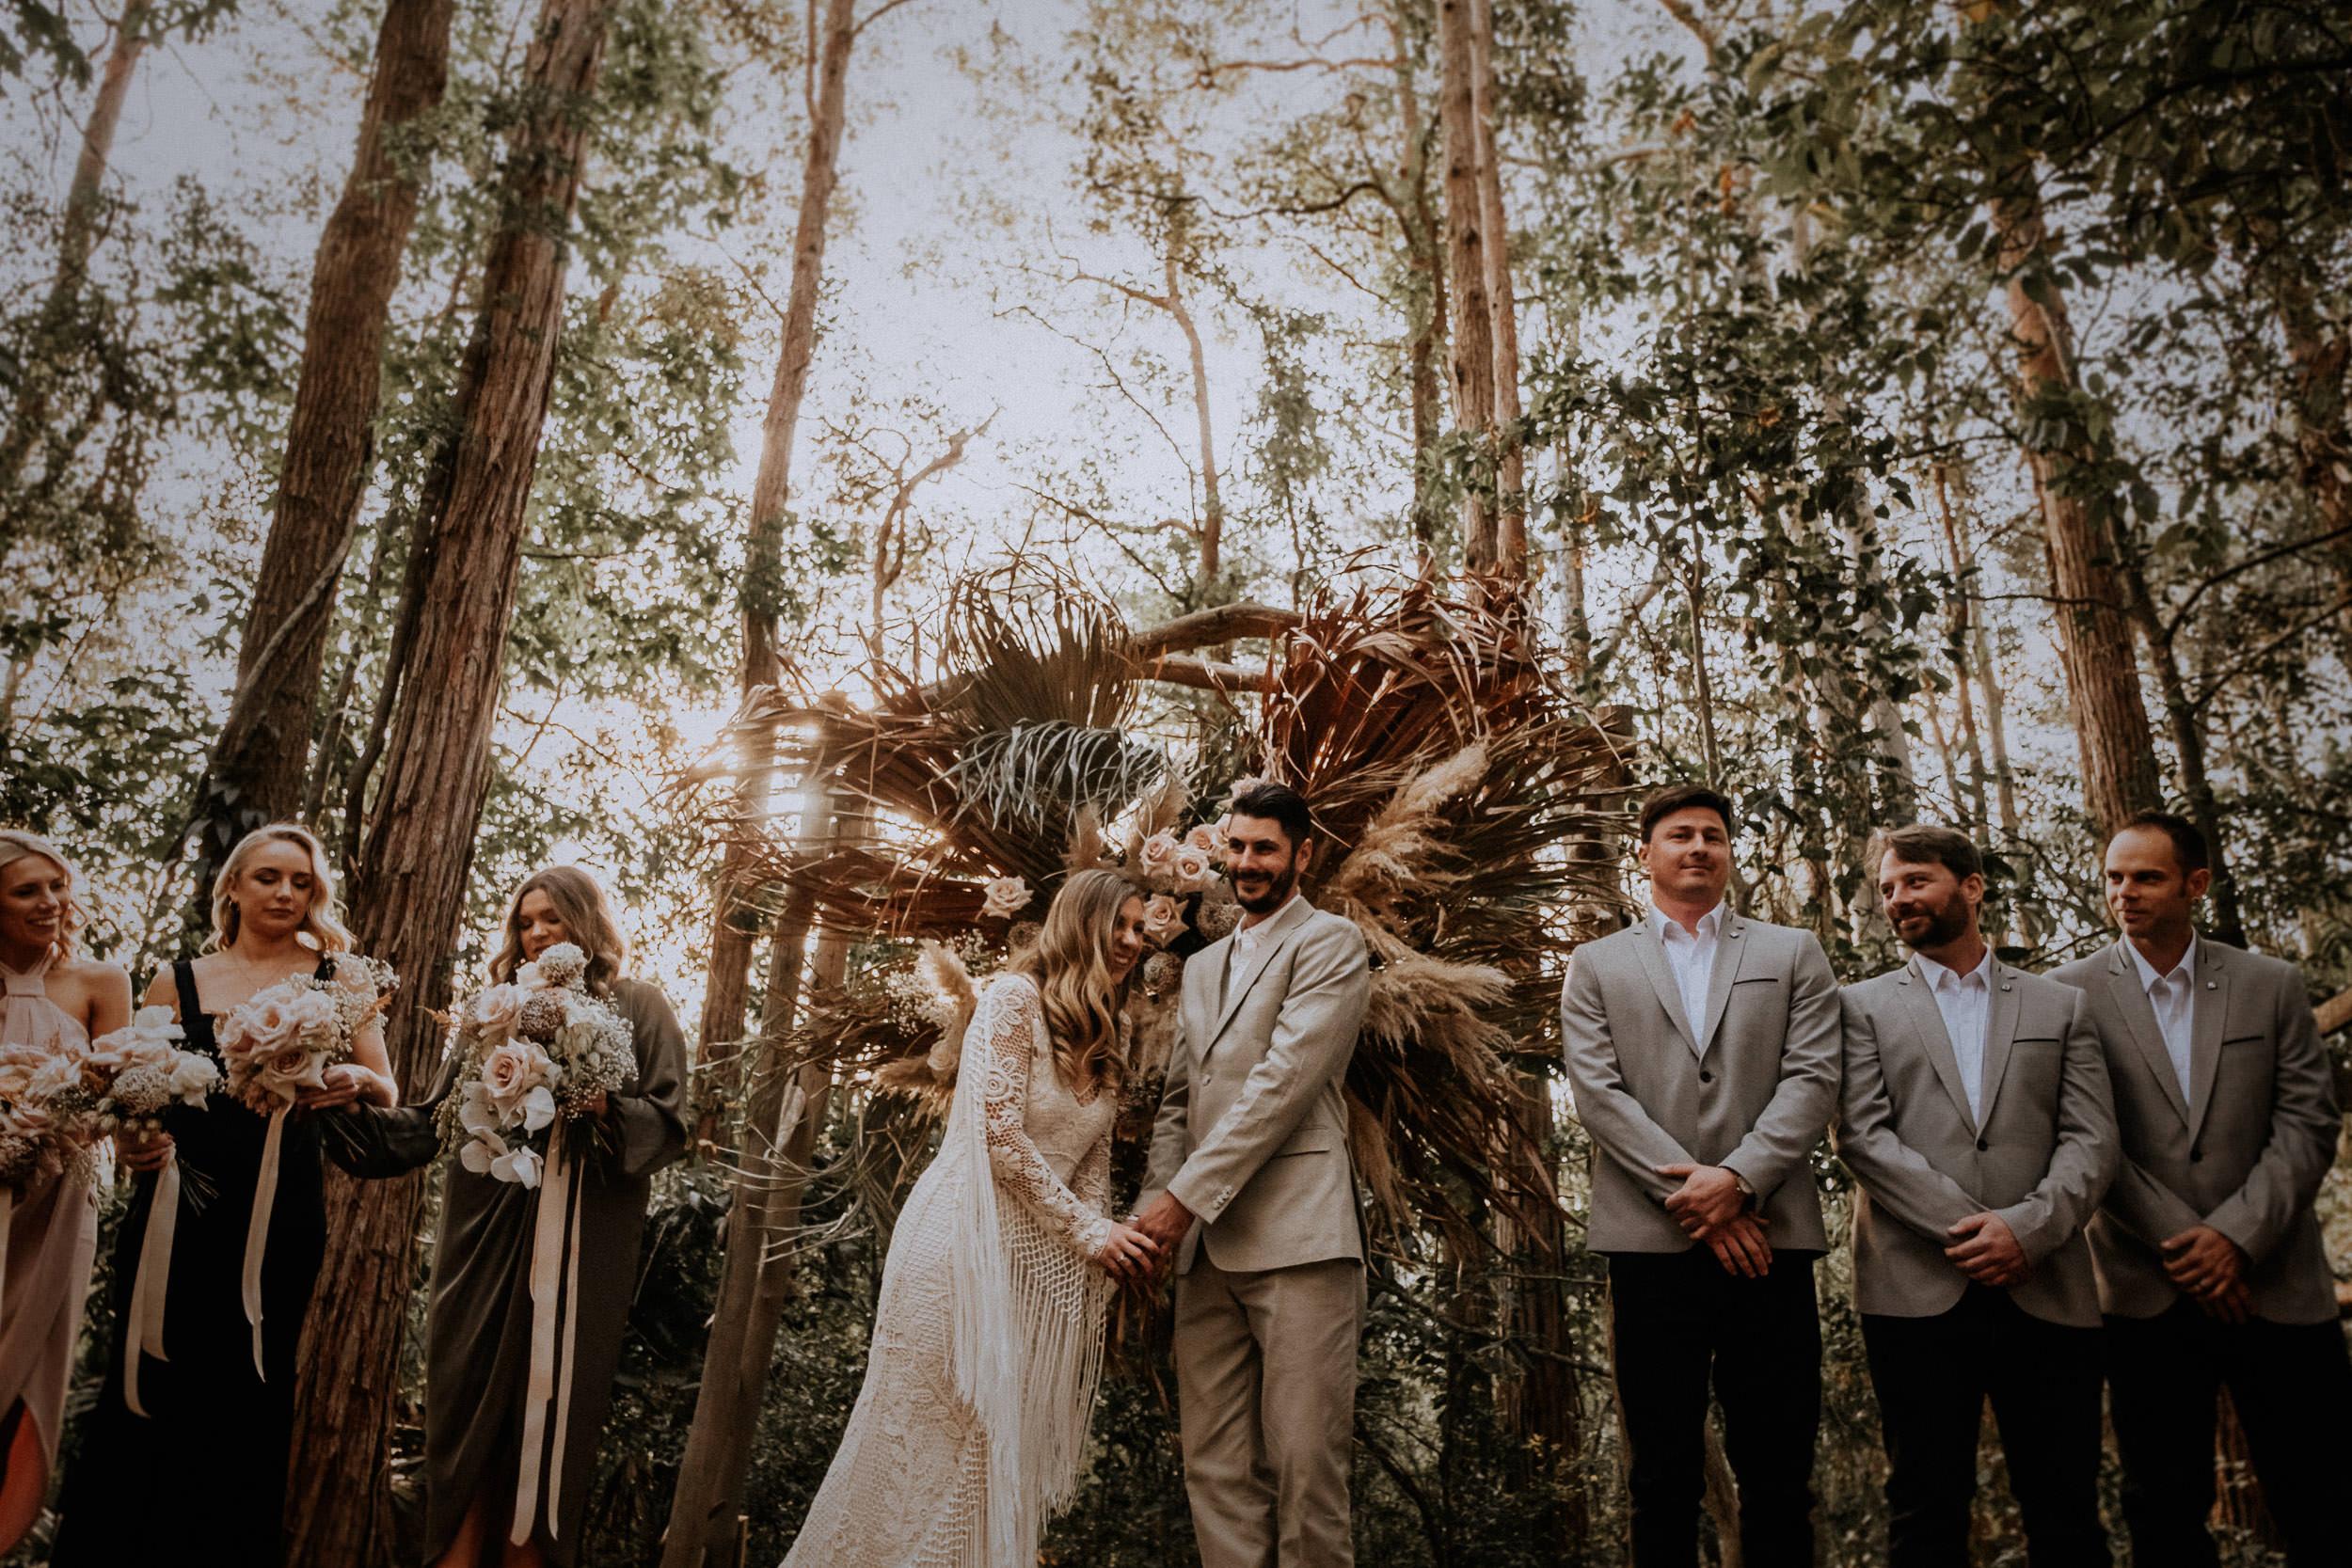 S&A Elopement - Kings & Thieves - Shred 'Til Dead - Central Coast Beach Forest Wedding - 228.jpg